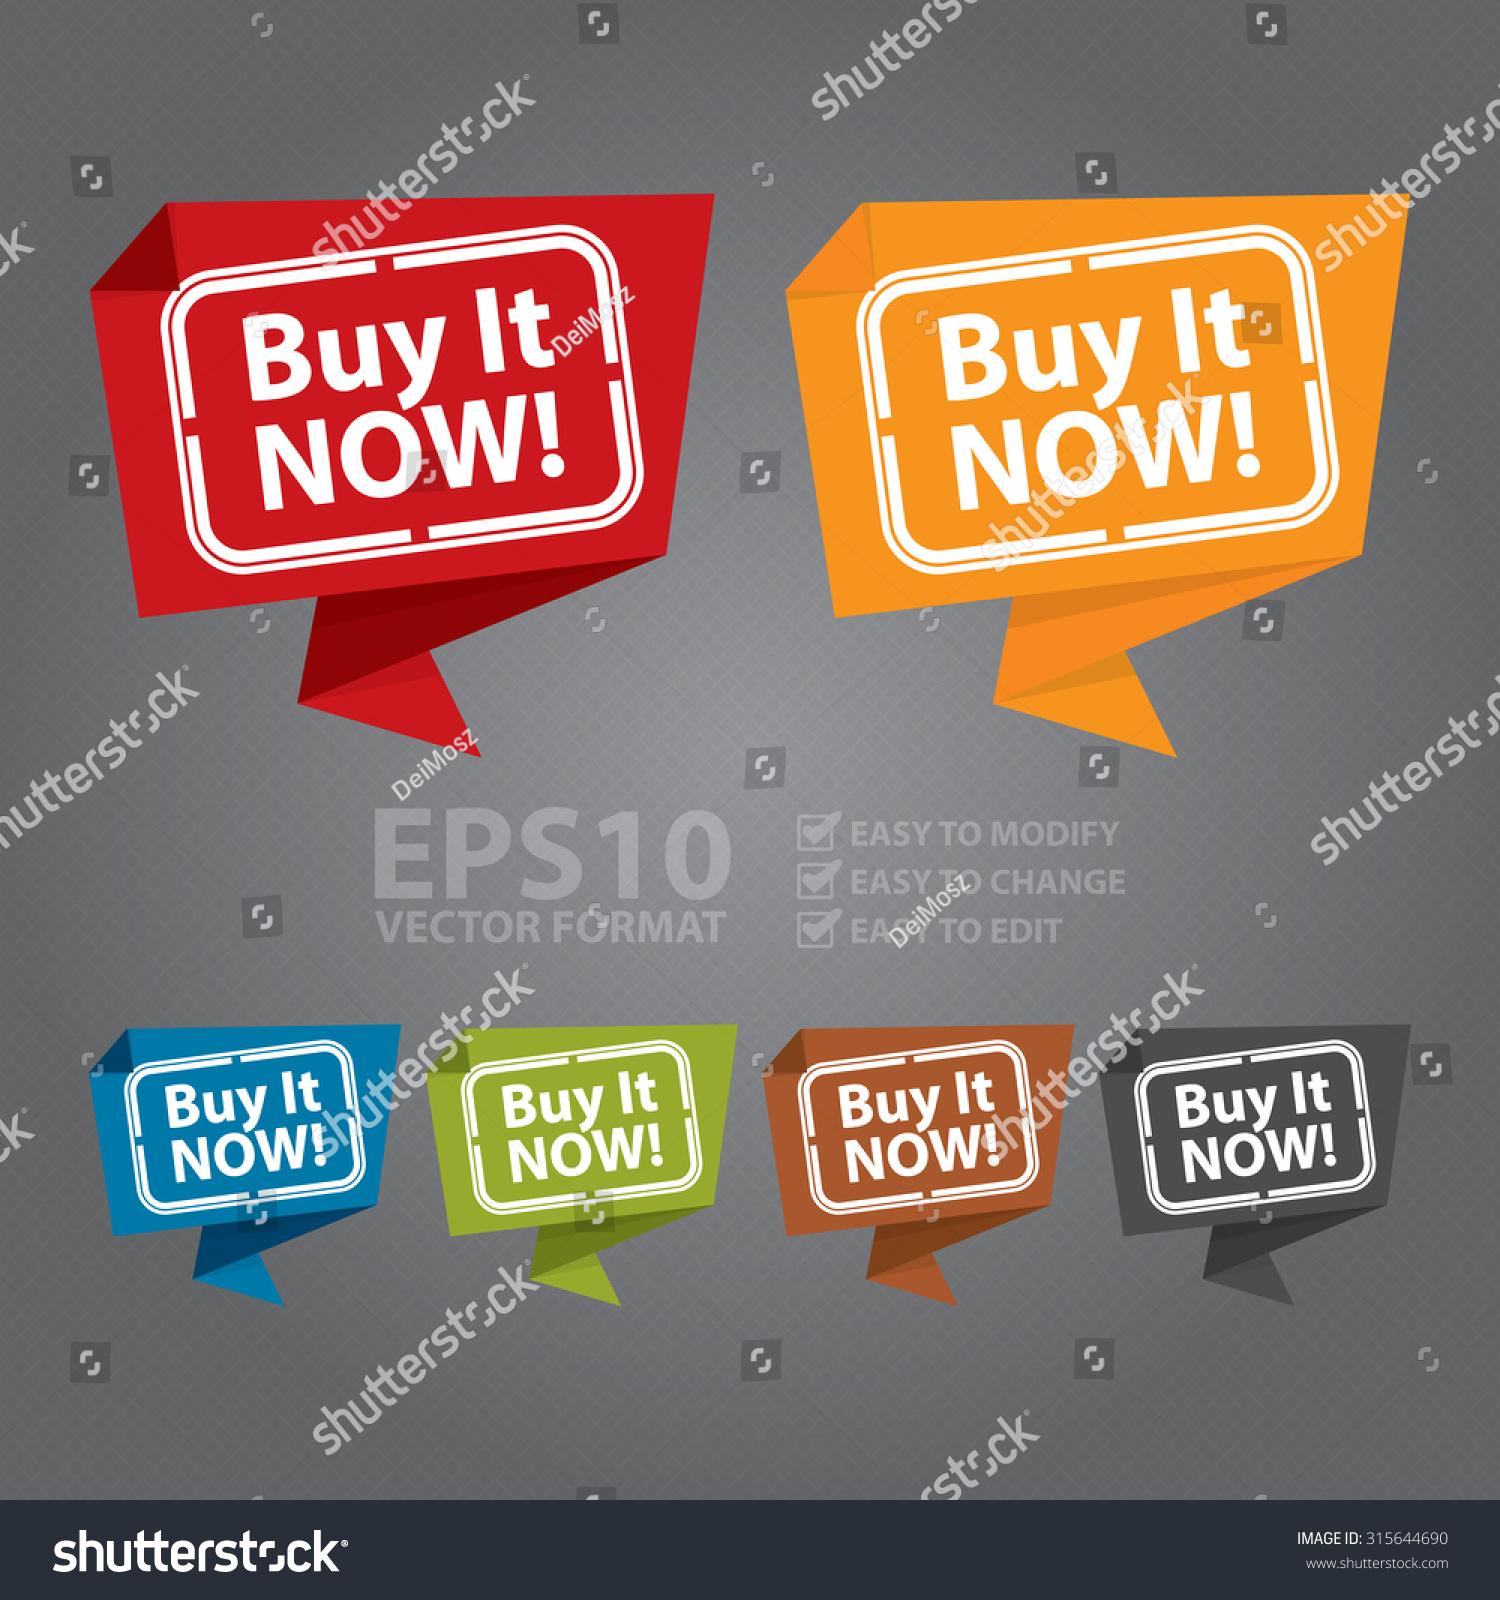 Buy a custom essay station image 2